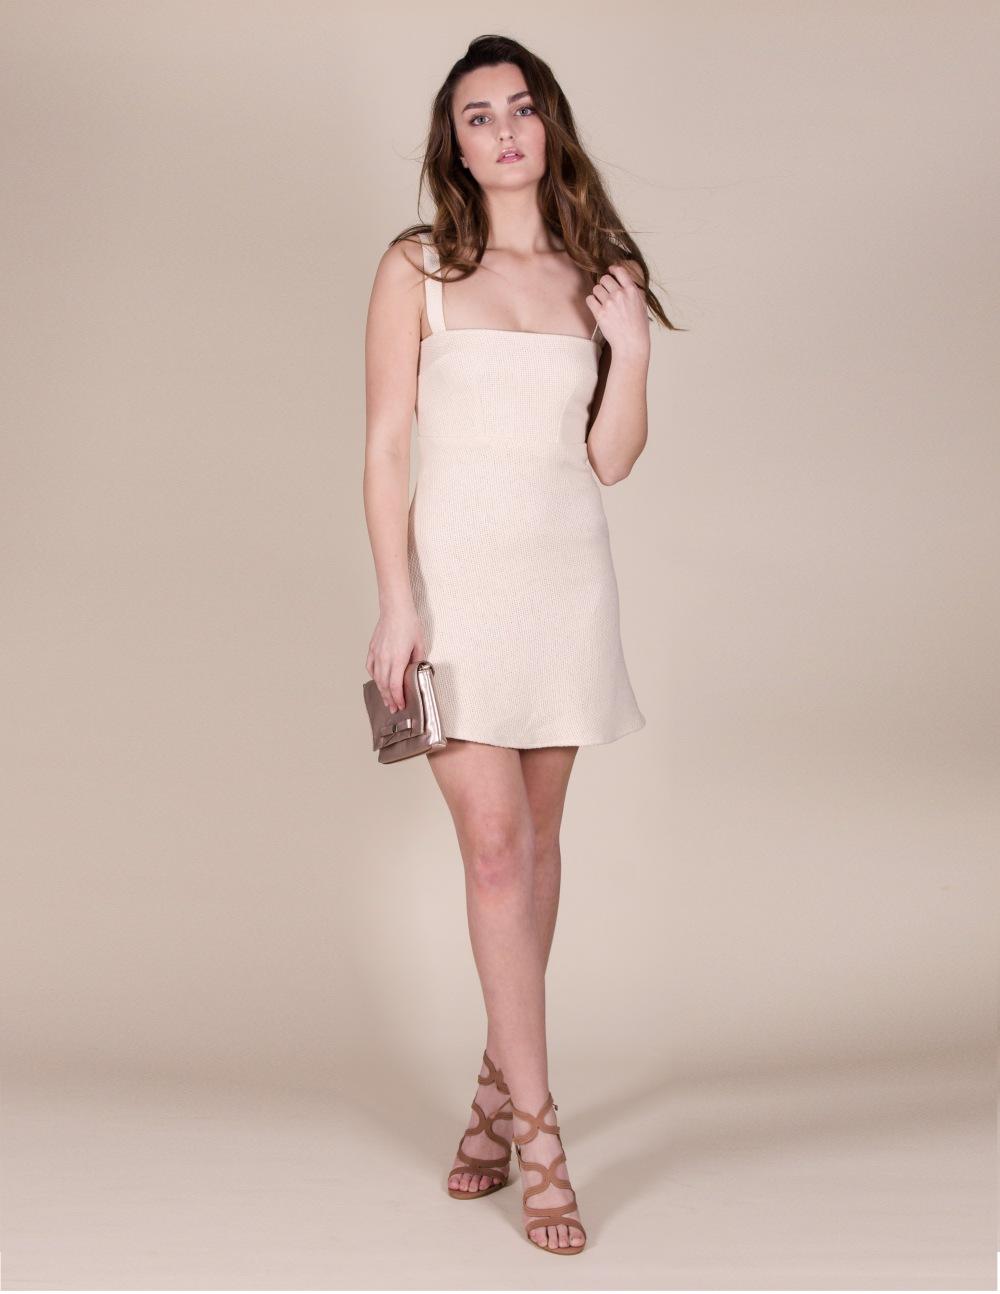 Alyssa Nicole The Mila Dress 1